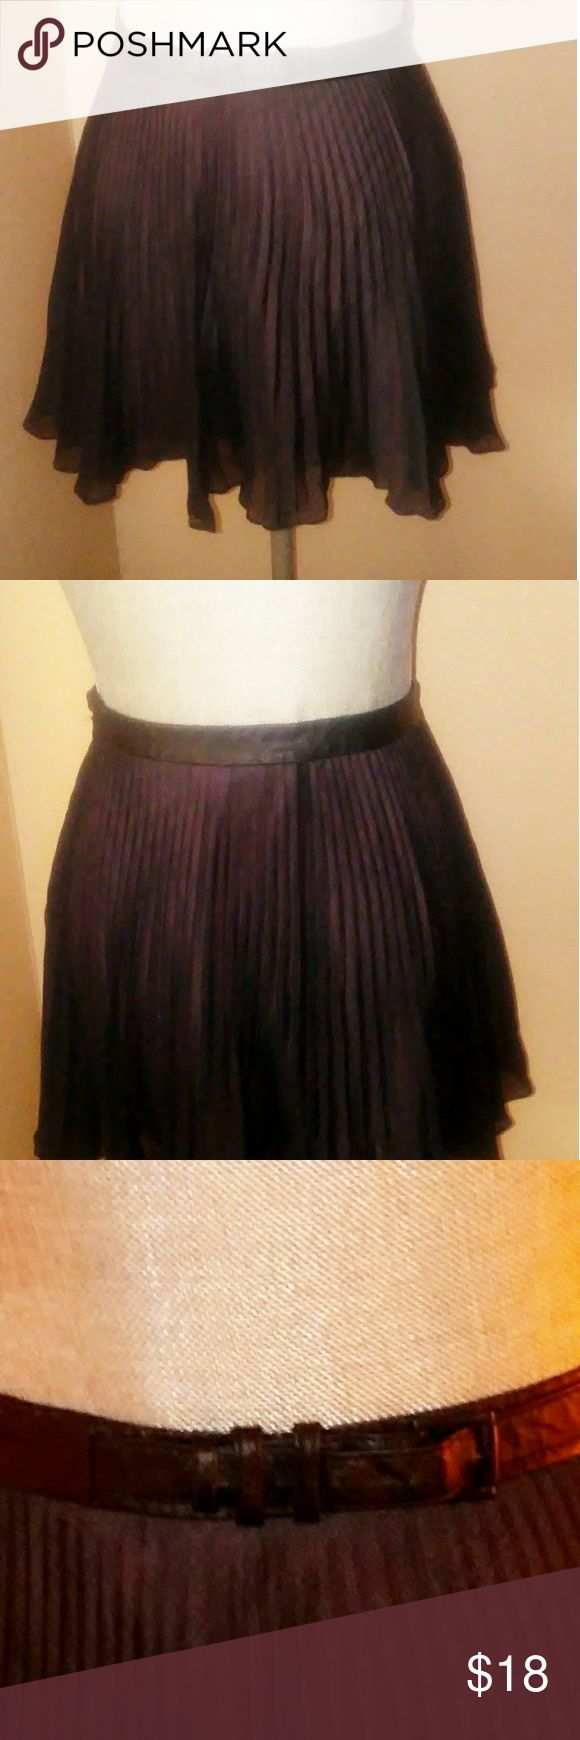 Bcbgeneration skirt Pleated mini skirt BCBGeneration Skirts Mini